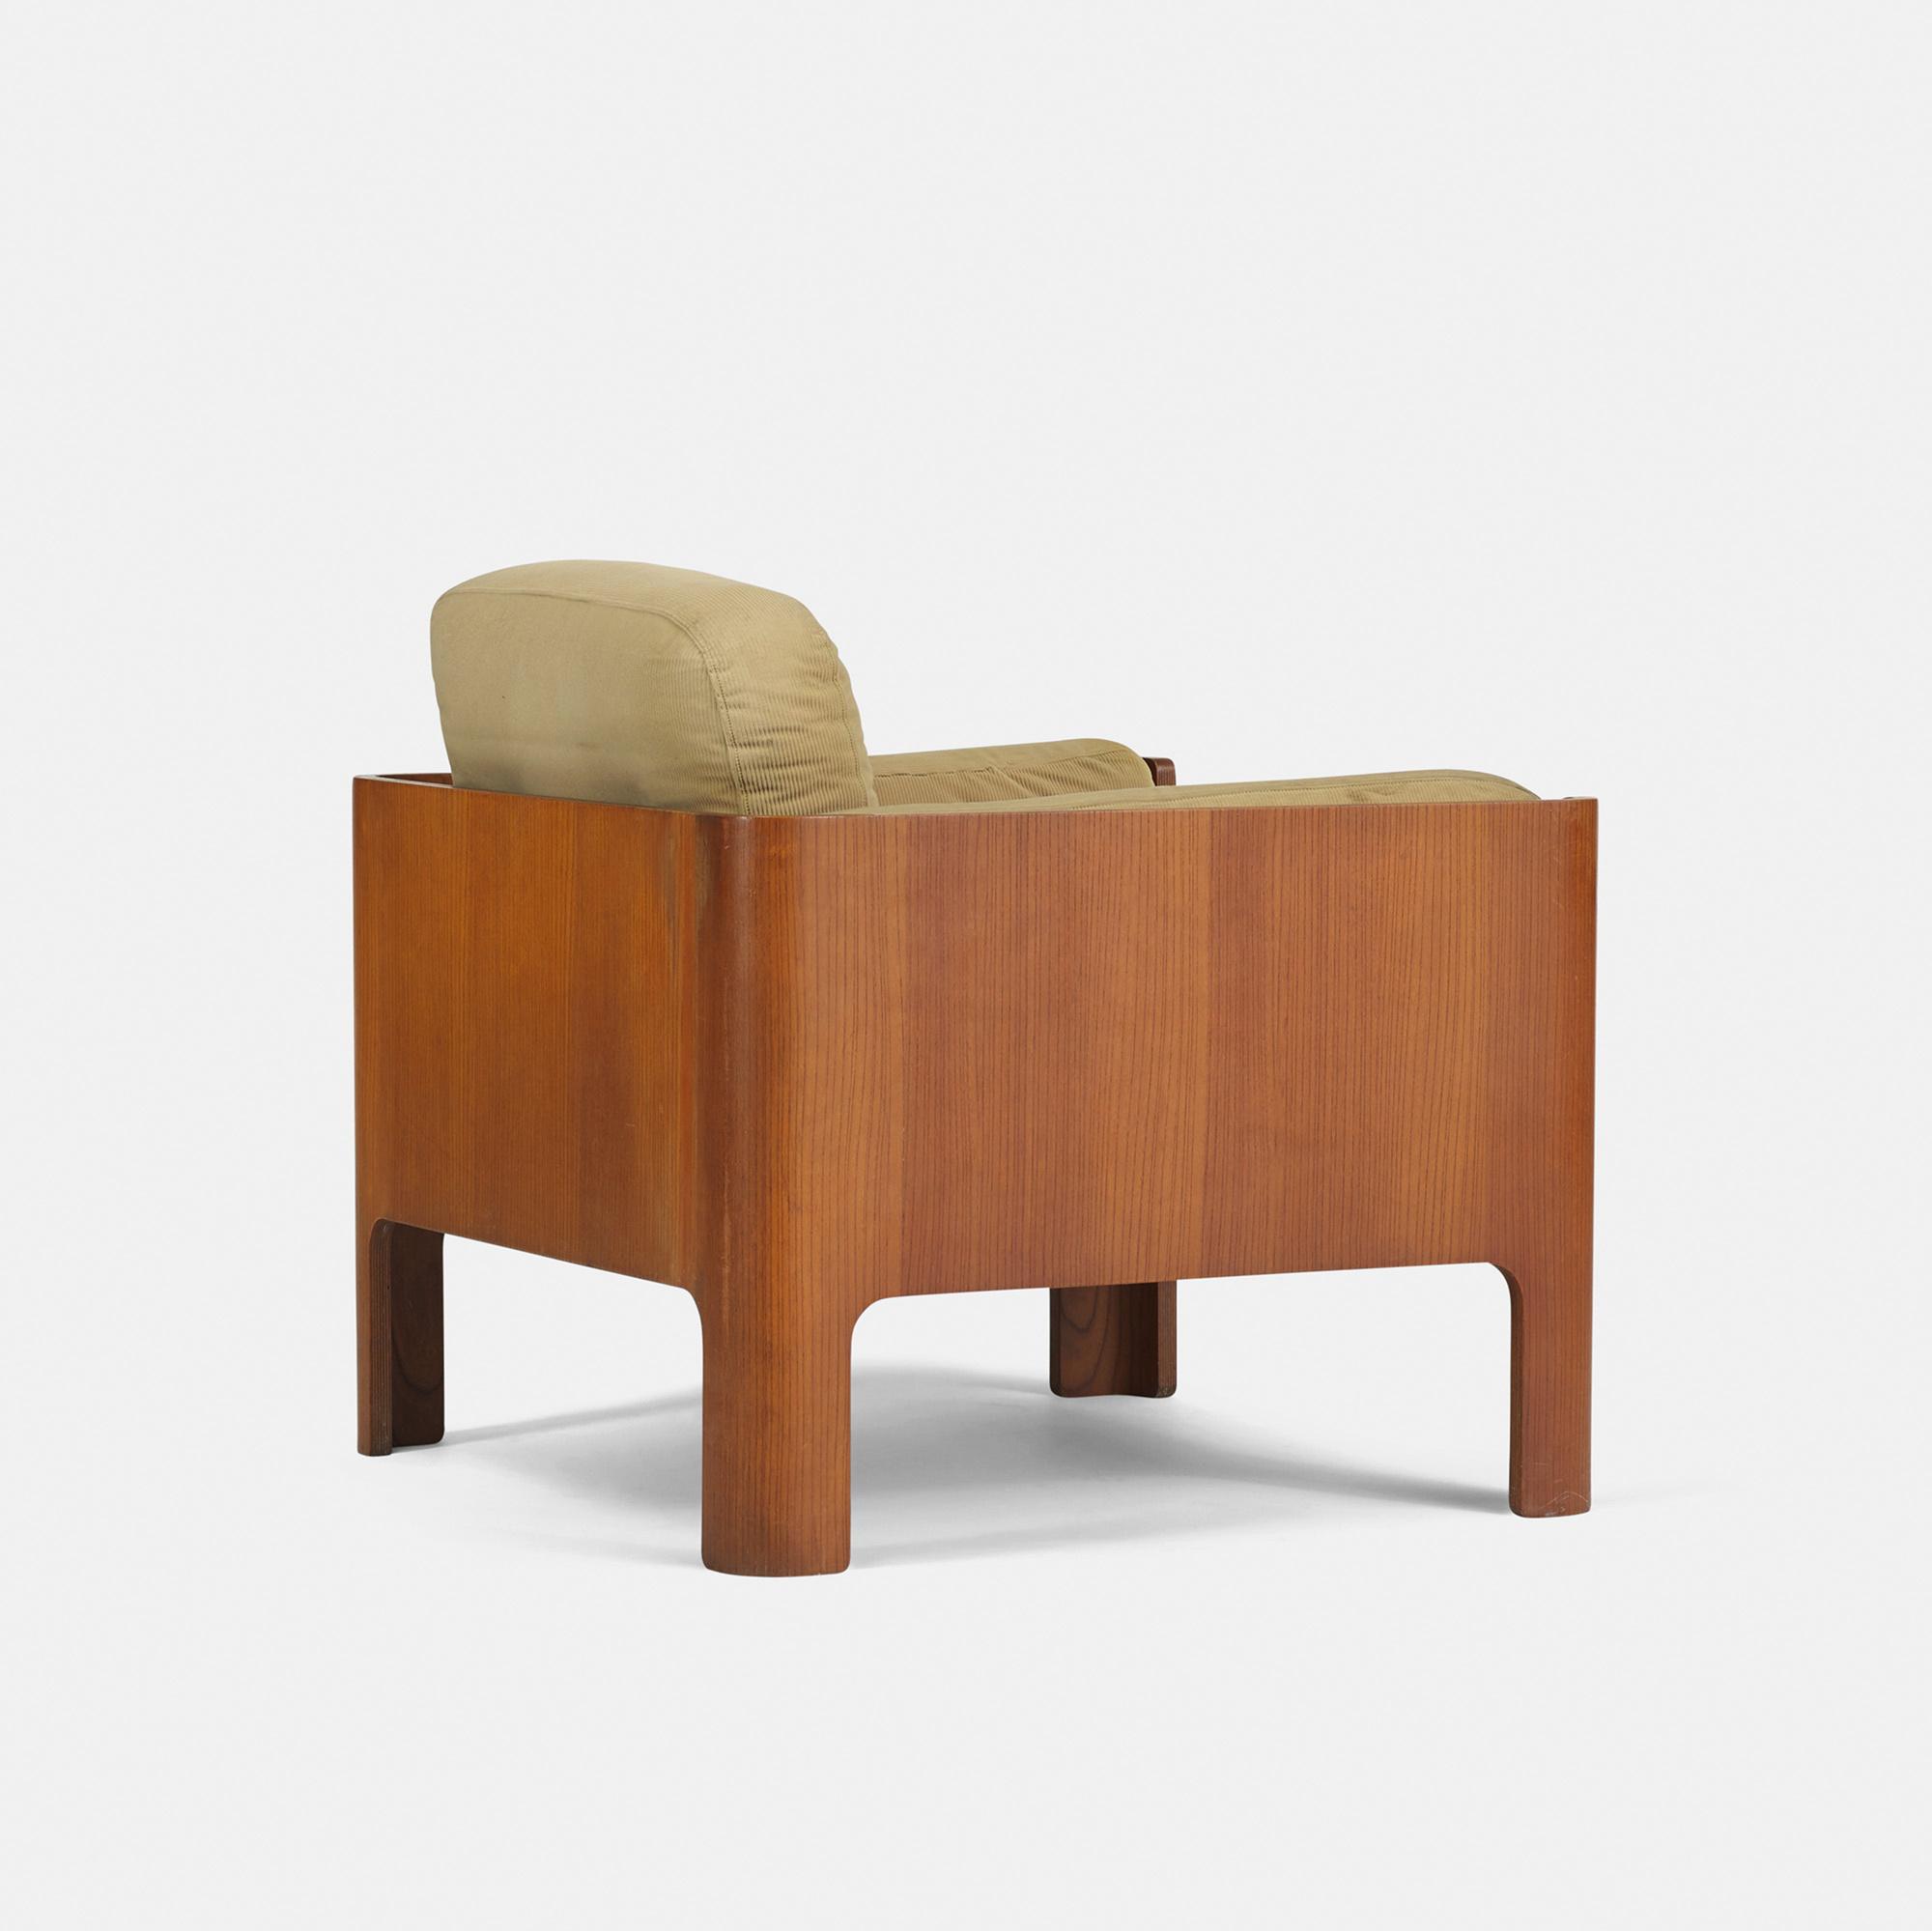 385: Isamu Kenmochi / lounge chair (1 of 3)